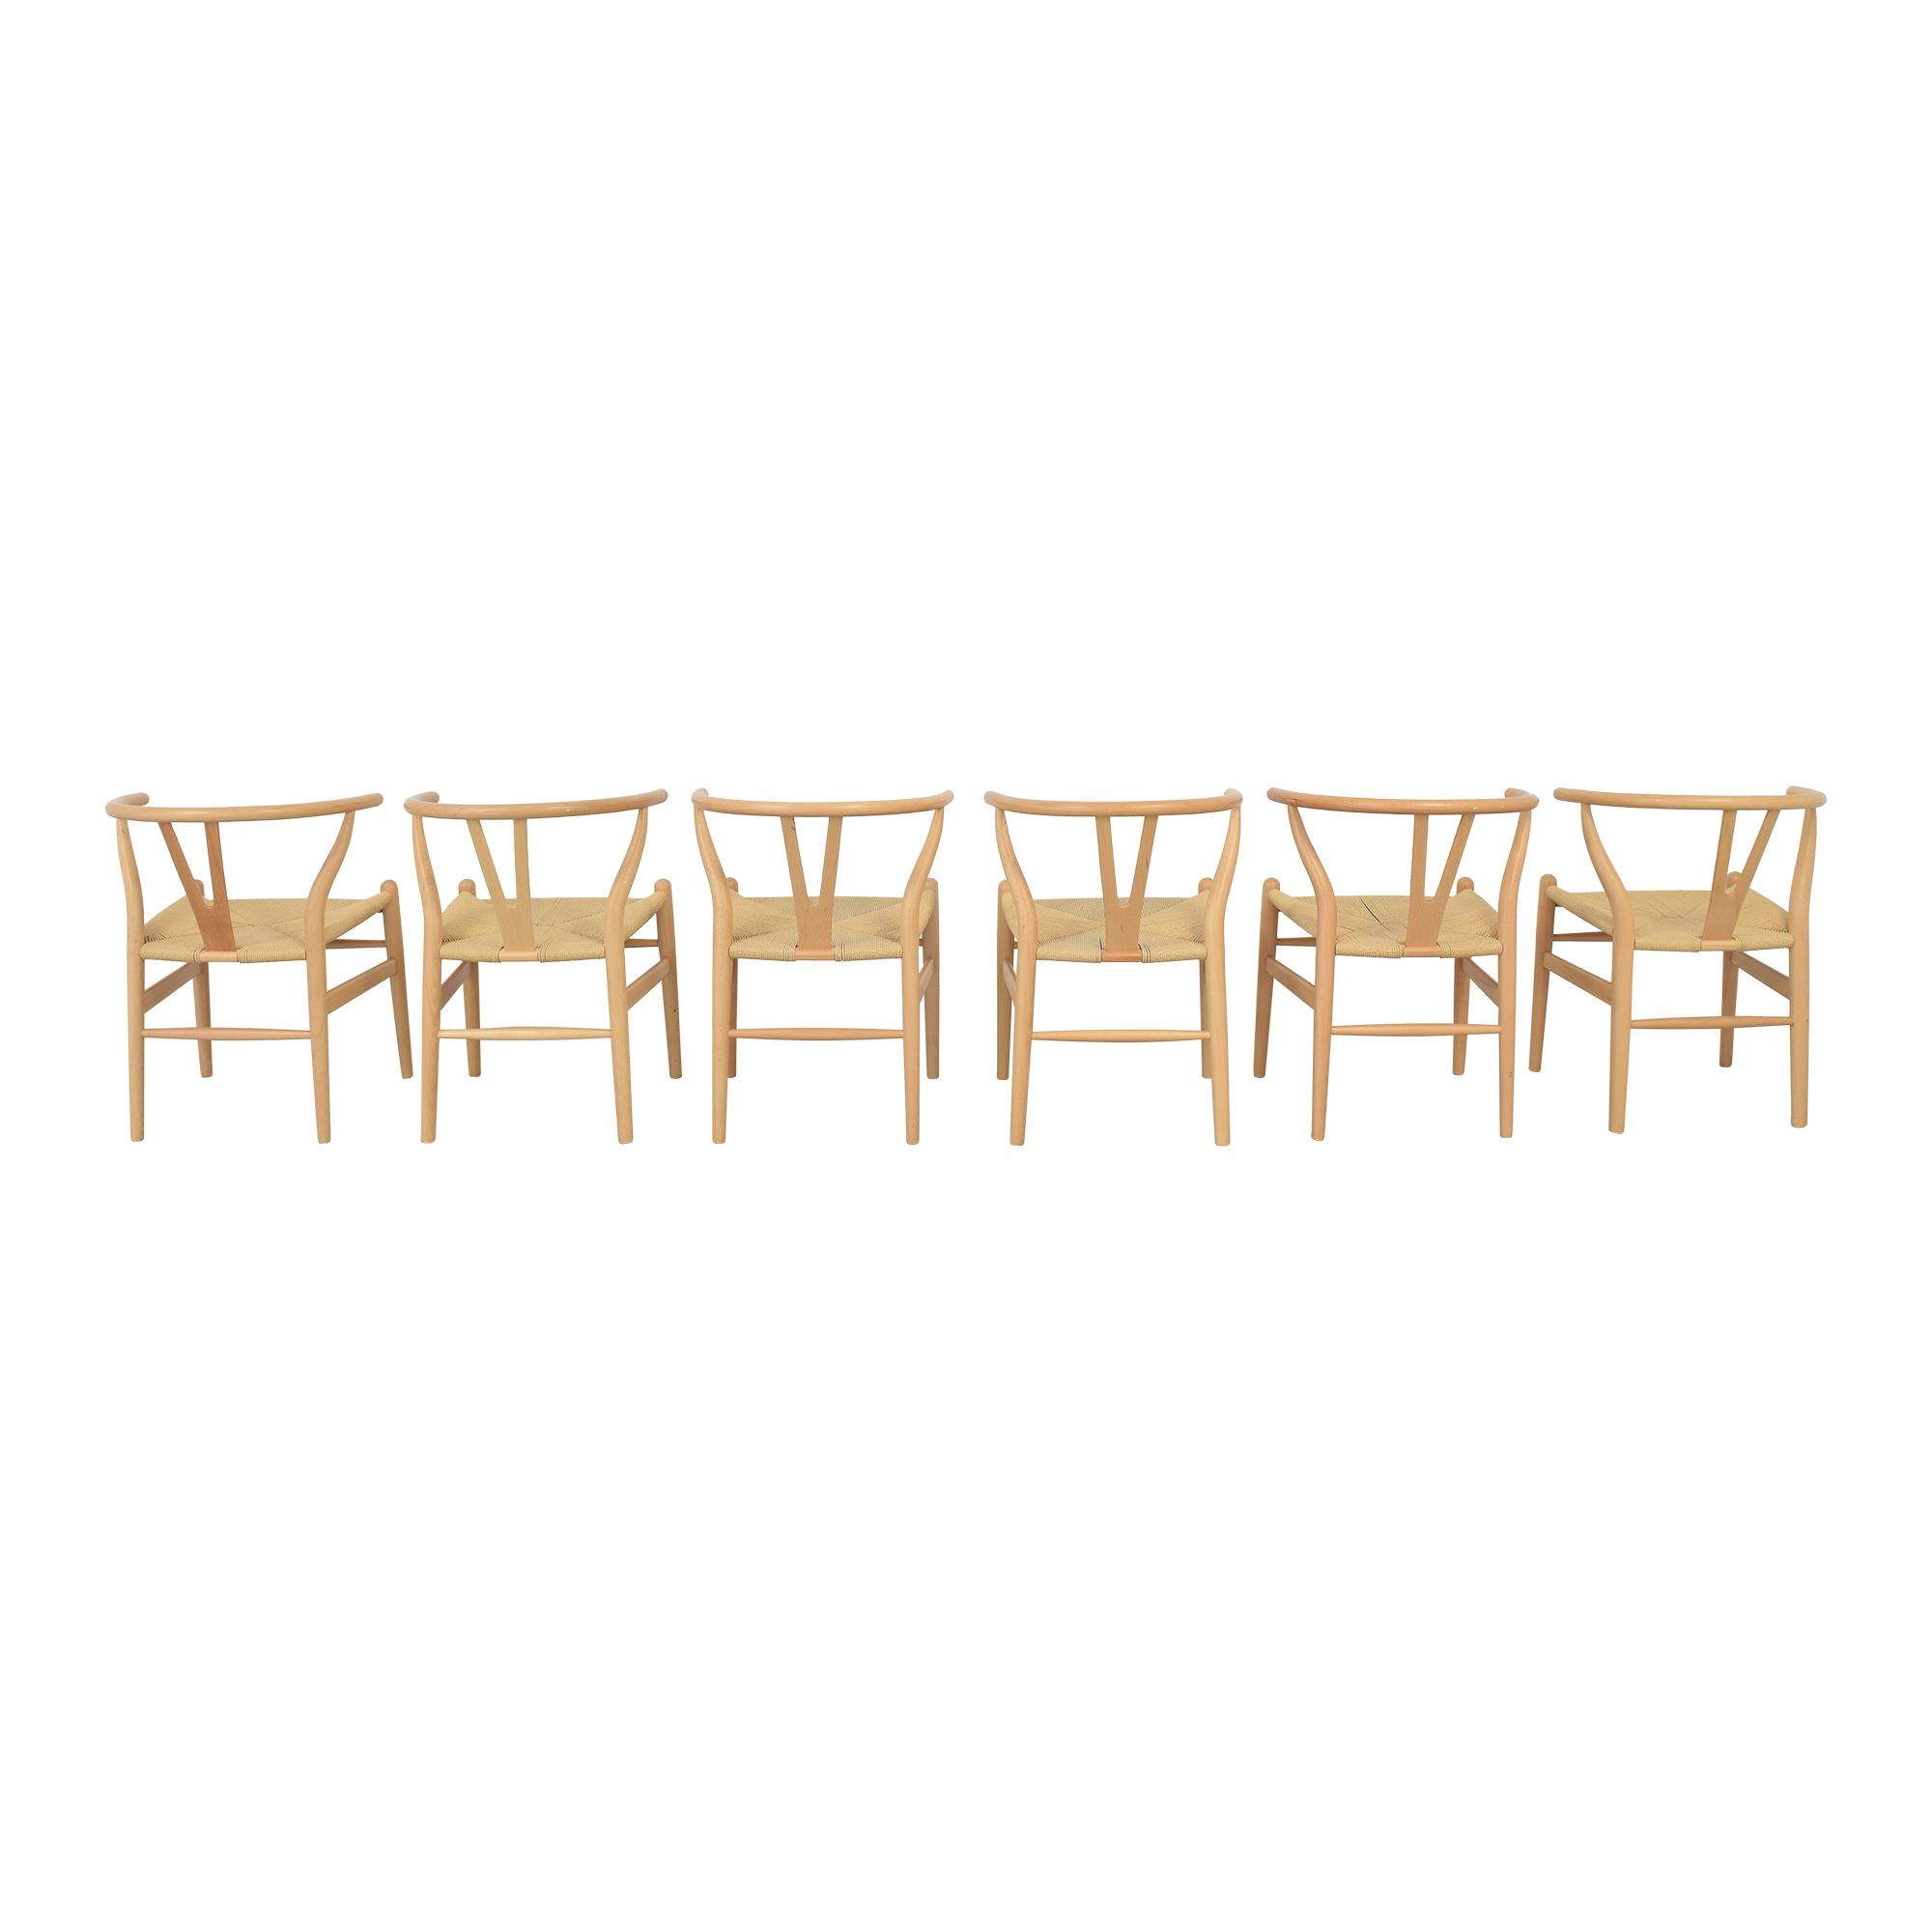 Baxton Studio Baxton Studio Wishbone Modern Brown Wood Dining Chairs ma